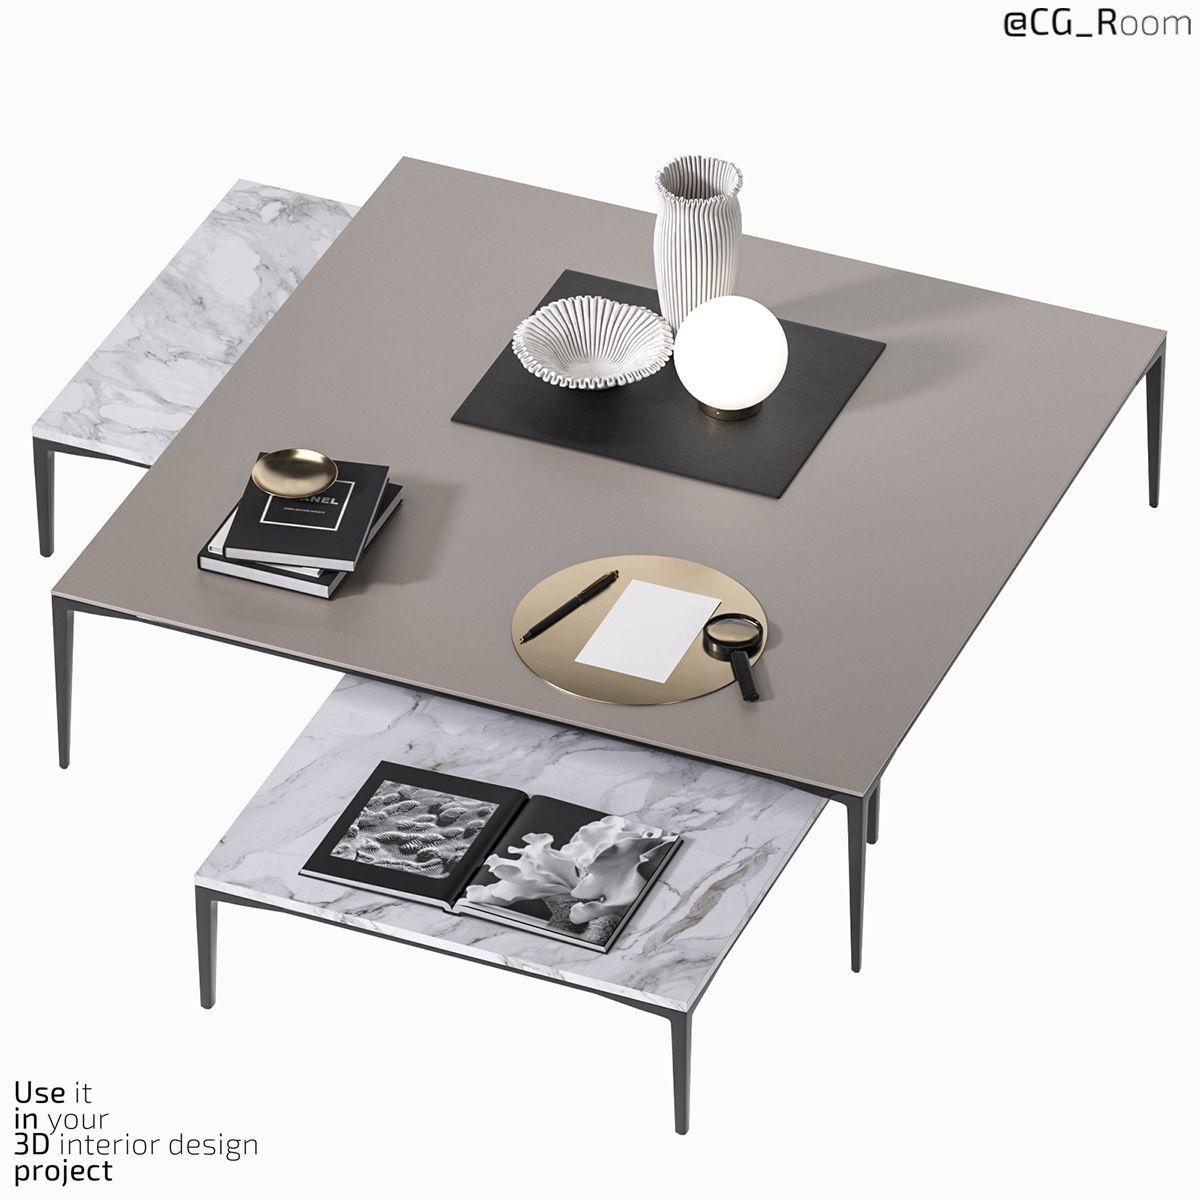 Coffee Table Tray 2 Rimadesio In 2020 Coffee Table Tray Coffee Table Tray Table [ 1200 x 1200 Pixel ]